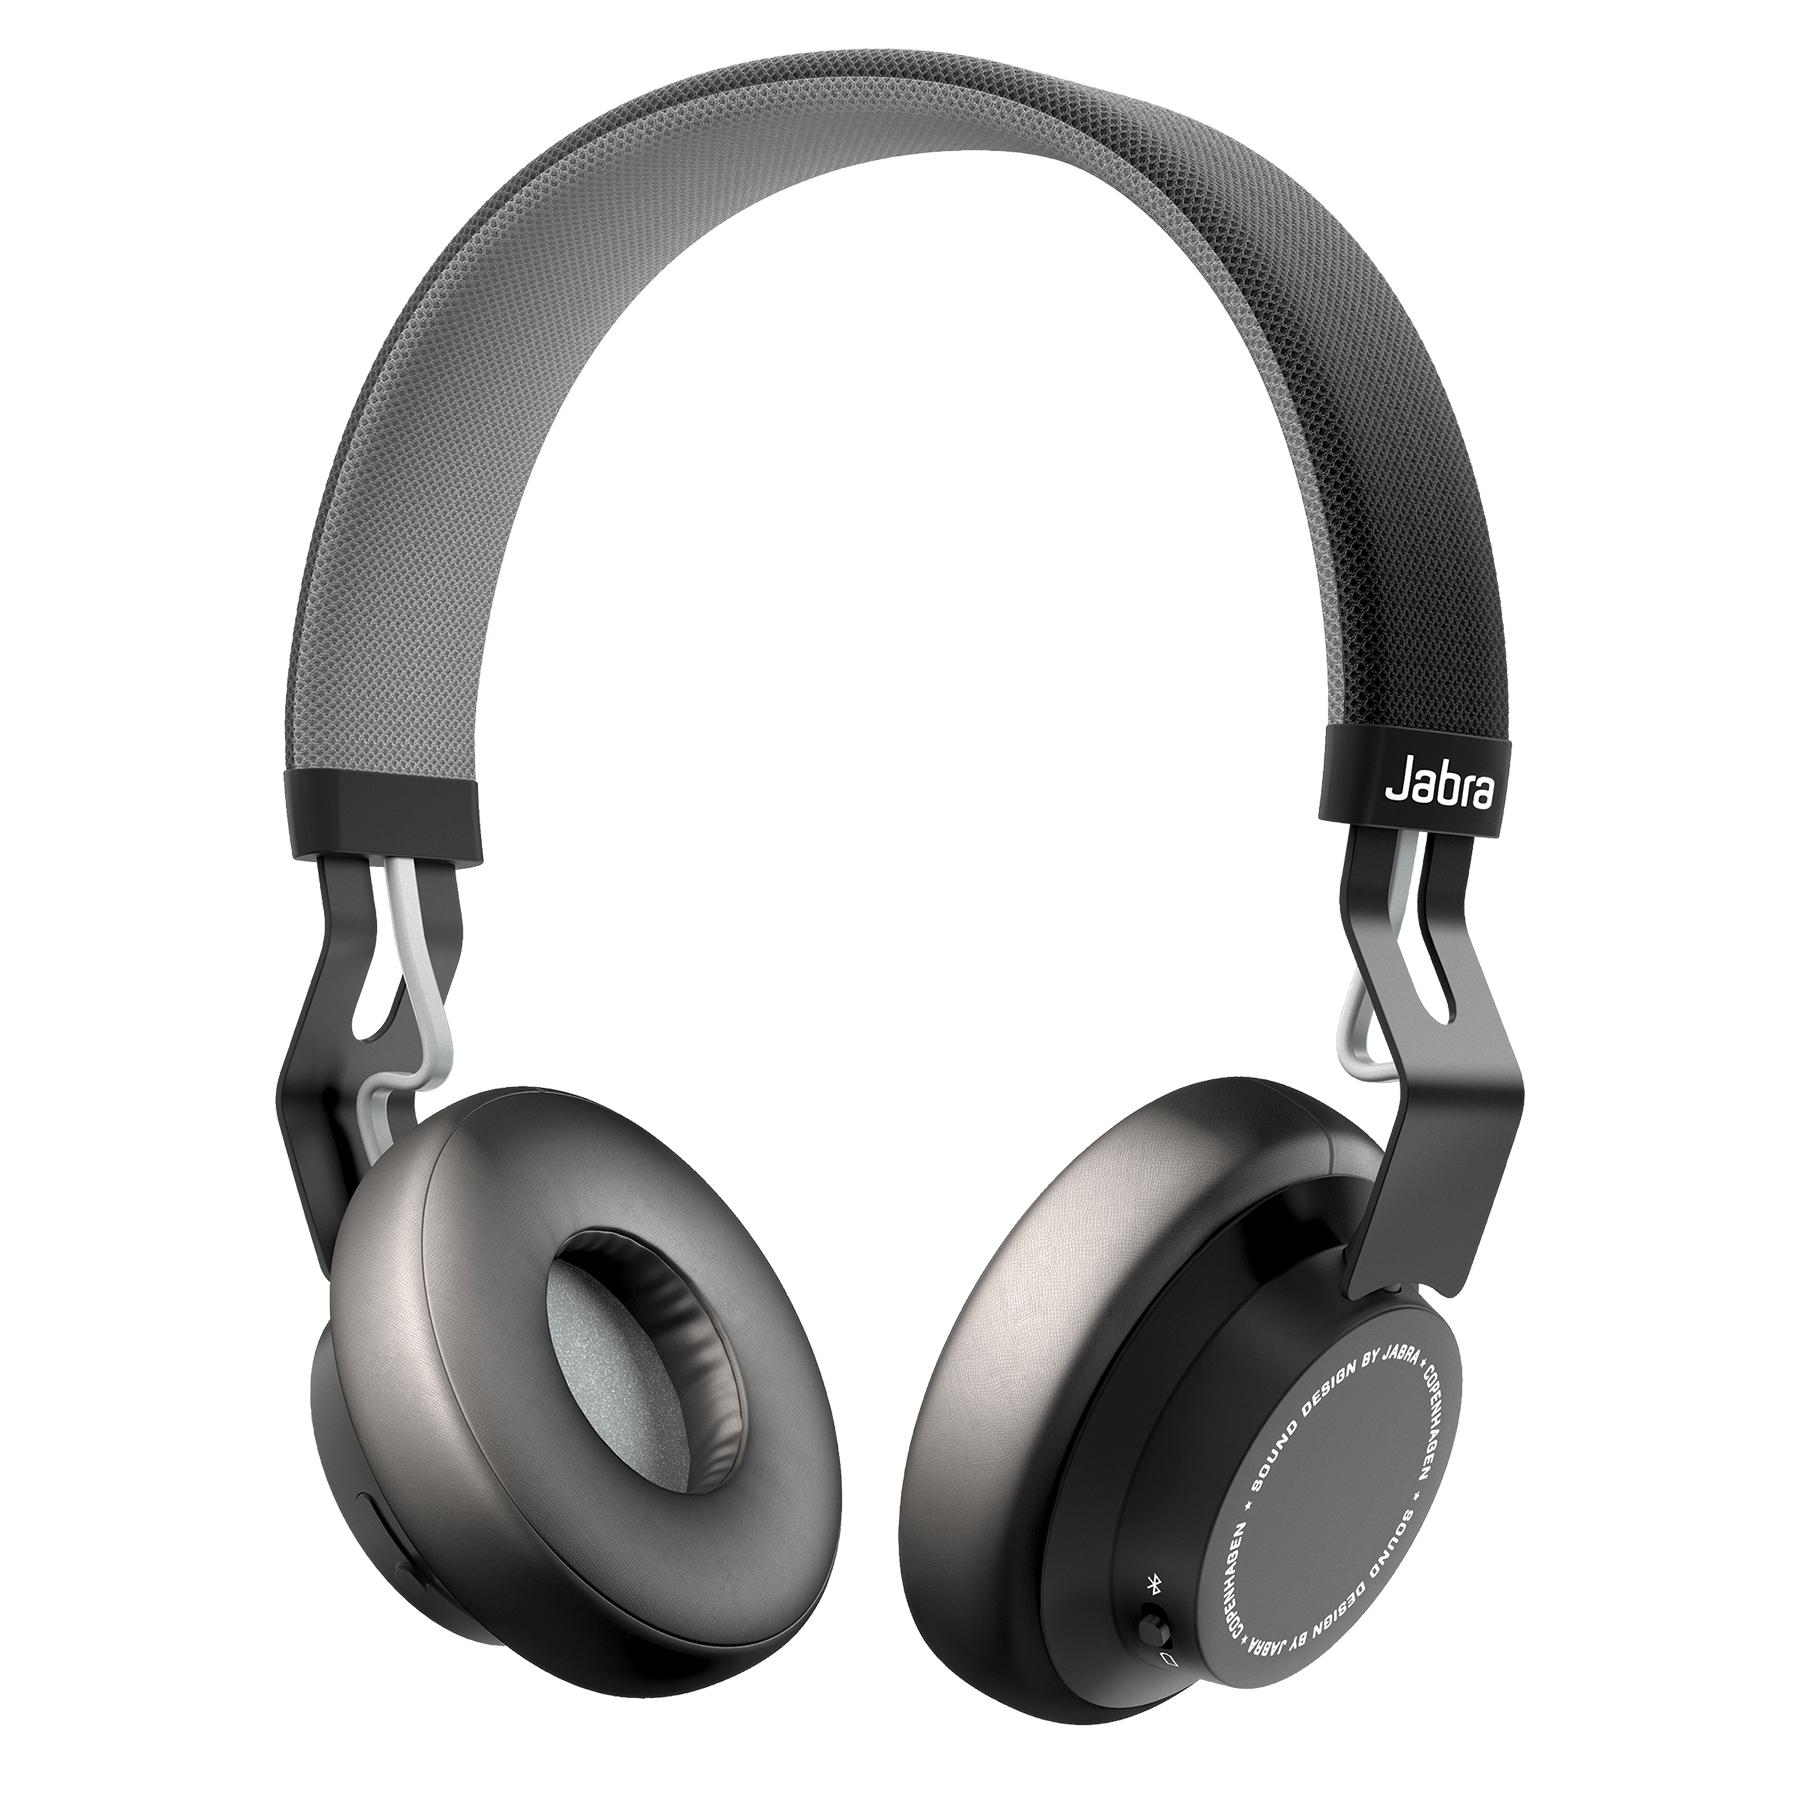 Casque audio sans-fil Jabra Move Wireless - Bluetooth (Plusieurs coloris)